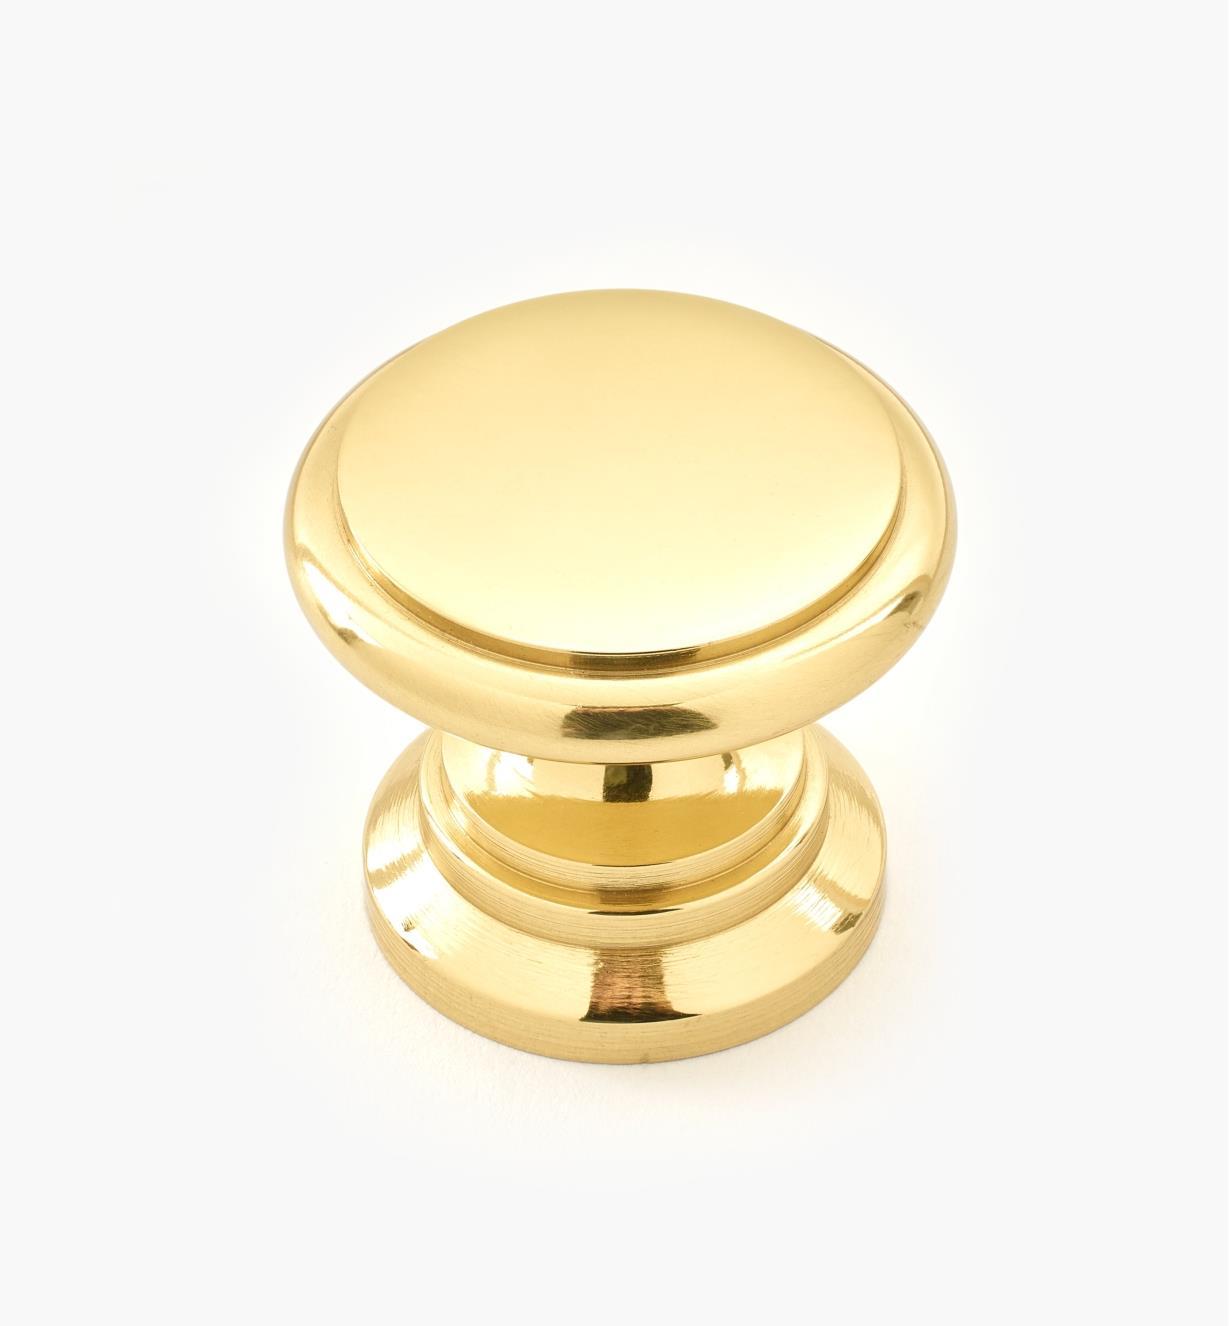 00W3425 - Petit bouton en laiton II, 1 po x 13/16 po